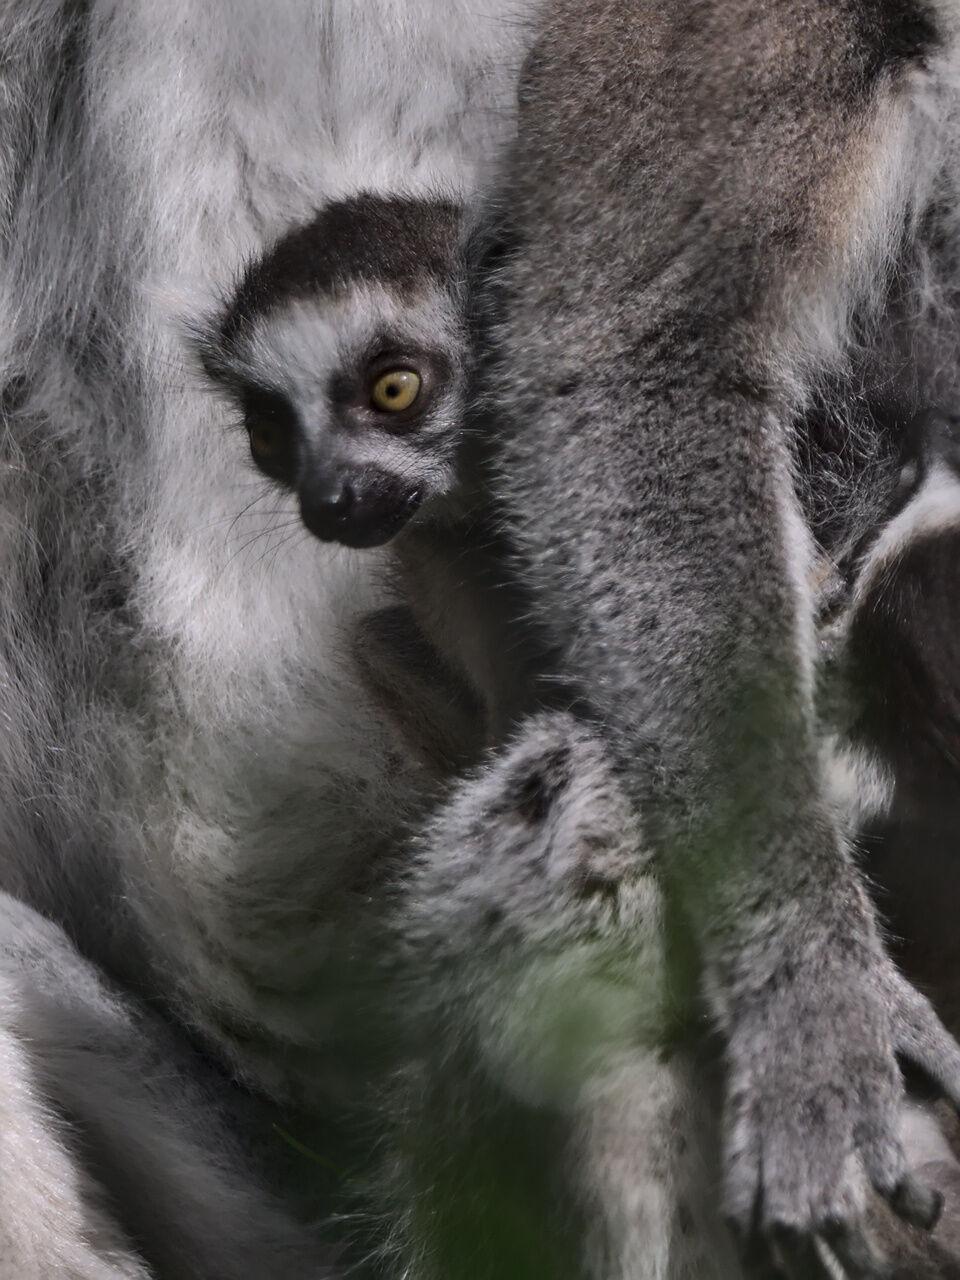 20200524_Zoo_Landau_069